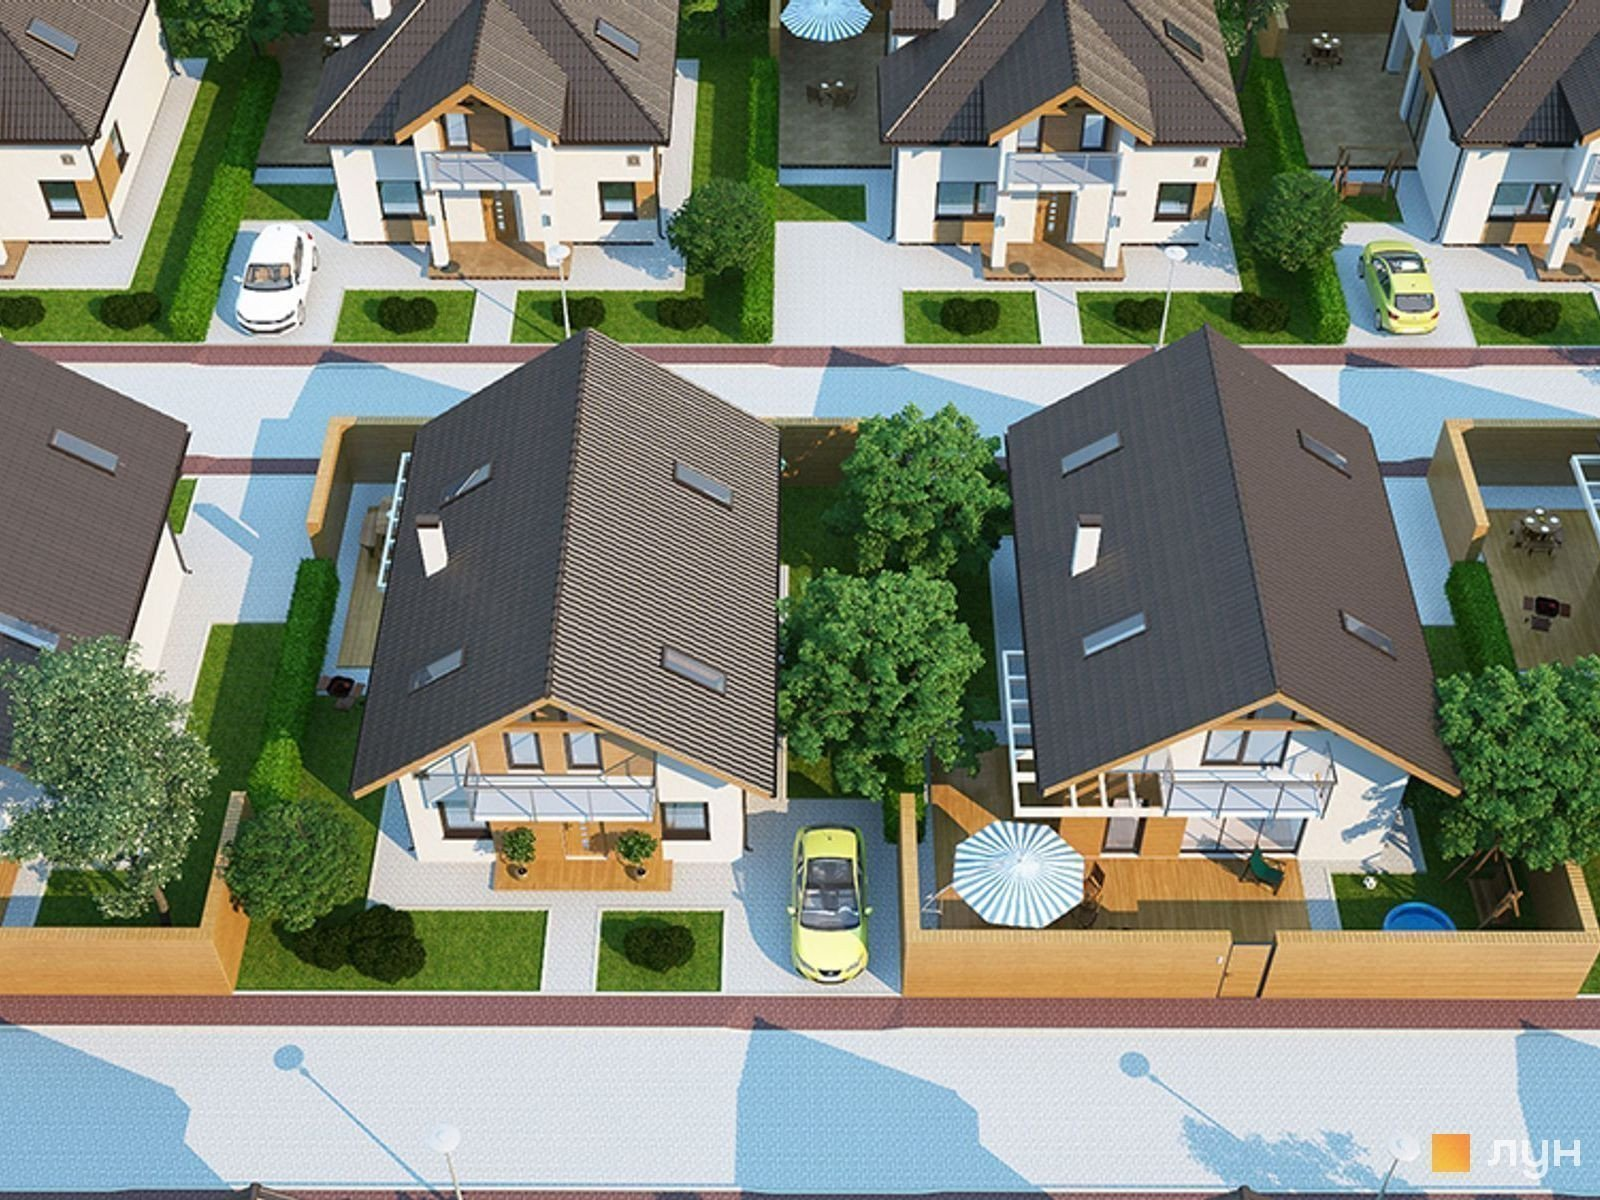 Buy a cottage town Kvartalchik cottage town